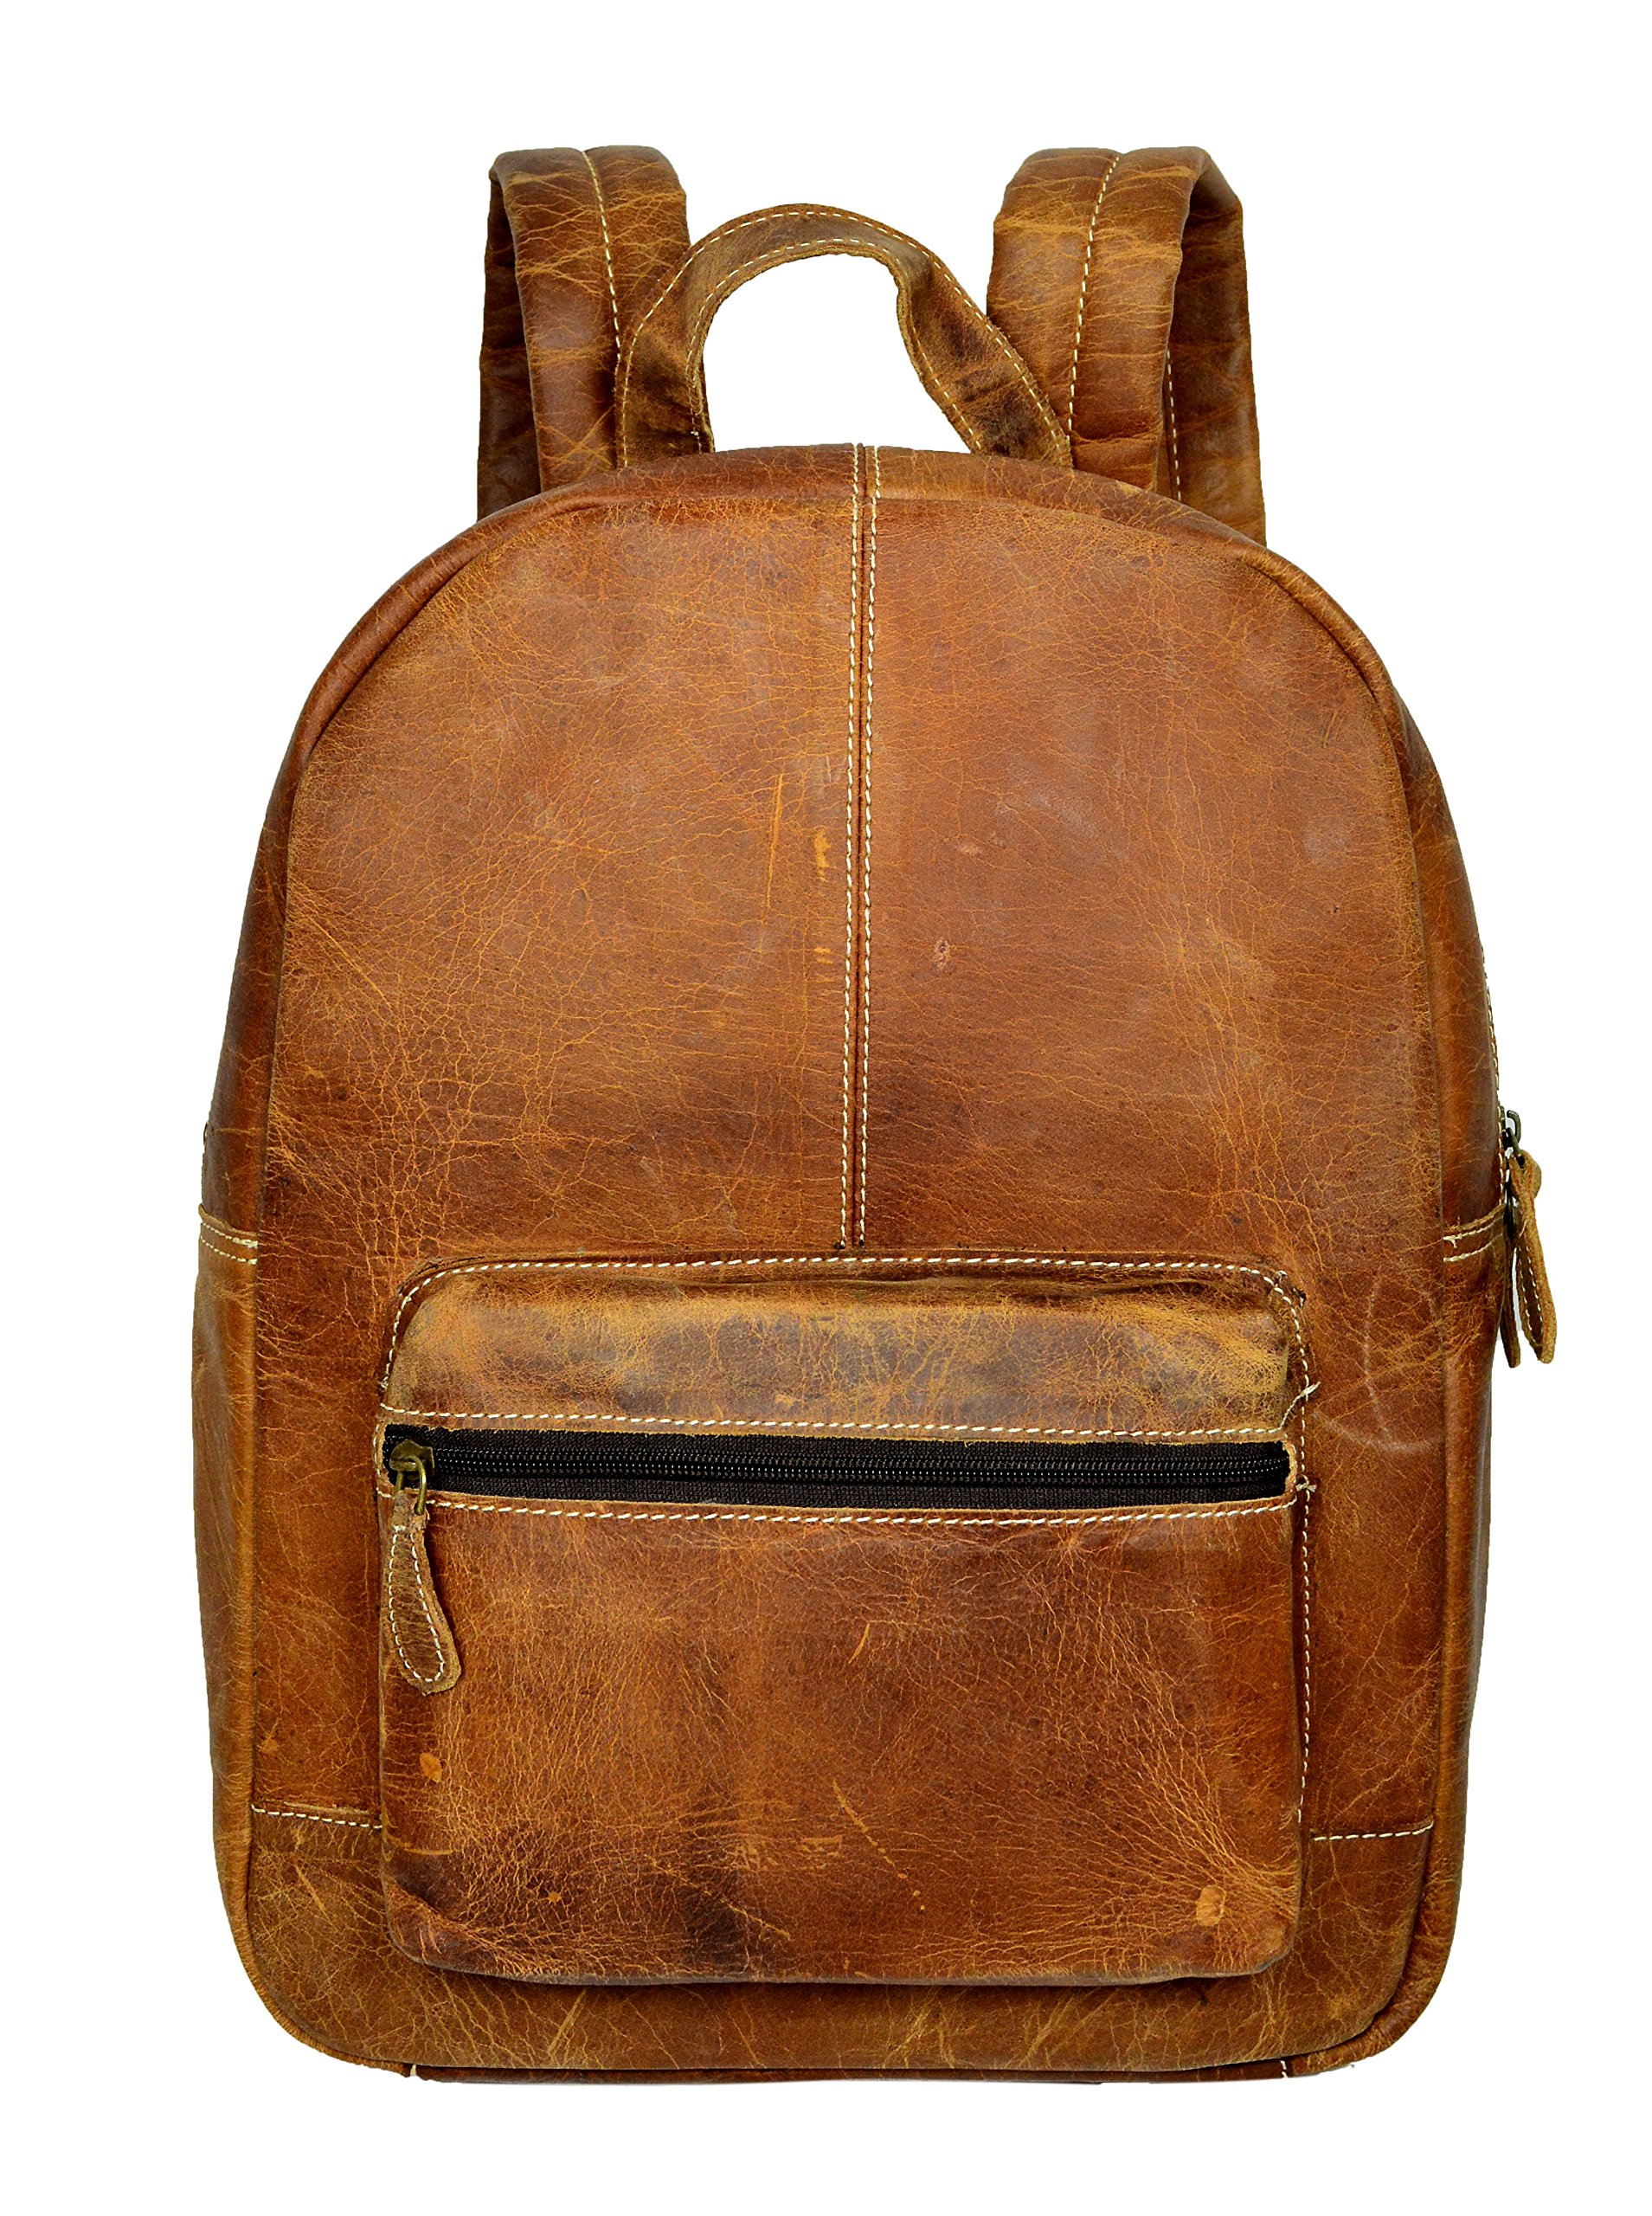 ADIMANI Vintage Crazy Horse Hunter Leather School College Backpack Bag Notebook Travel Bag 15x11 inches Unisex Bag